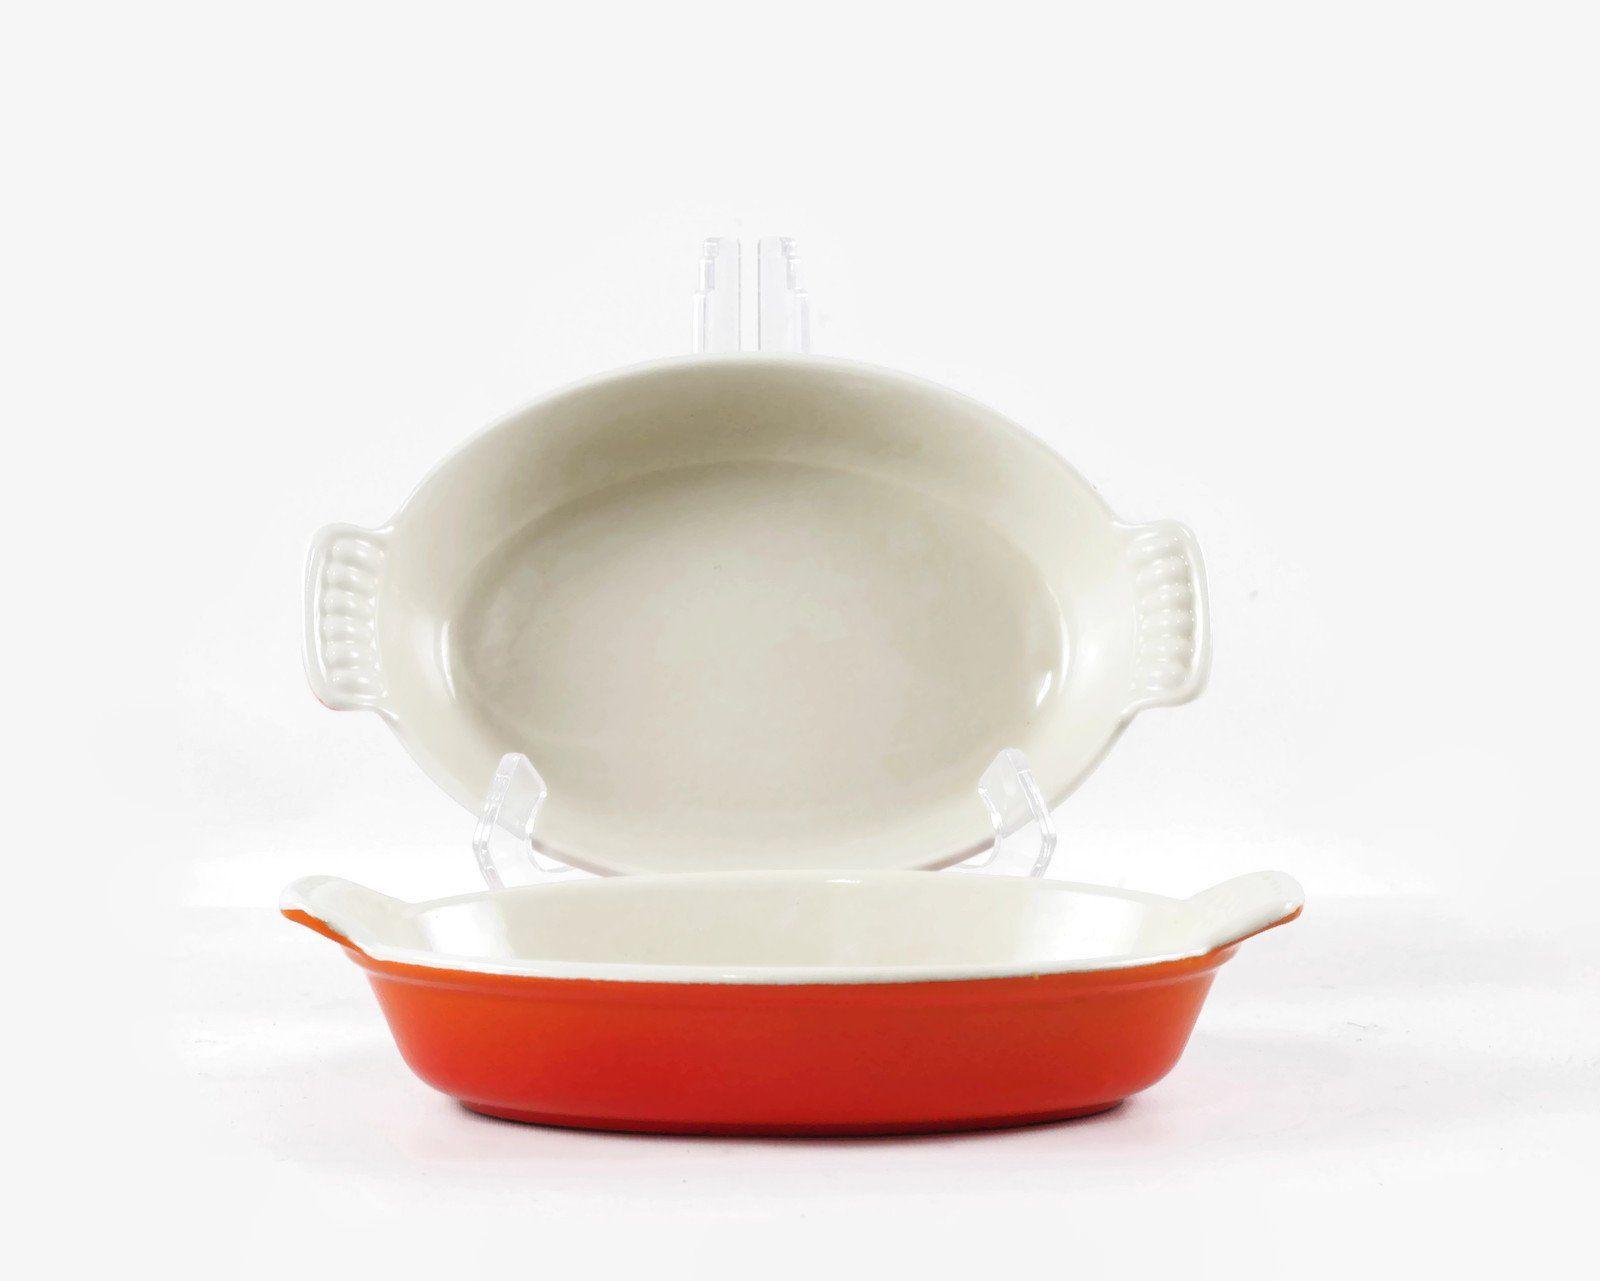 Vintage Le Creuset Enamel Cast Iron Oval Baking Dish 20 In Flame Orange Au Gratin Casserole Pan Choice Of Two Baked Dishes Au Gratin Creuset Le creuset oval baking dish